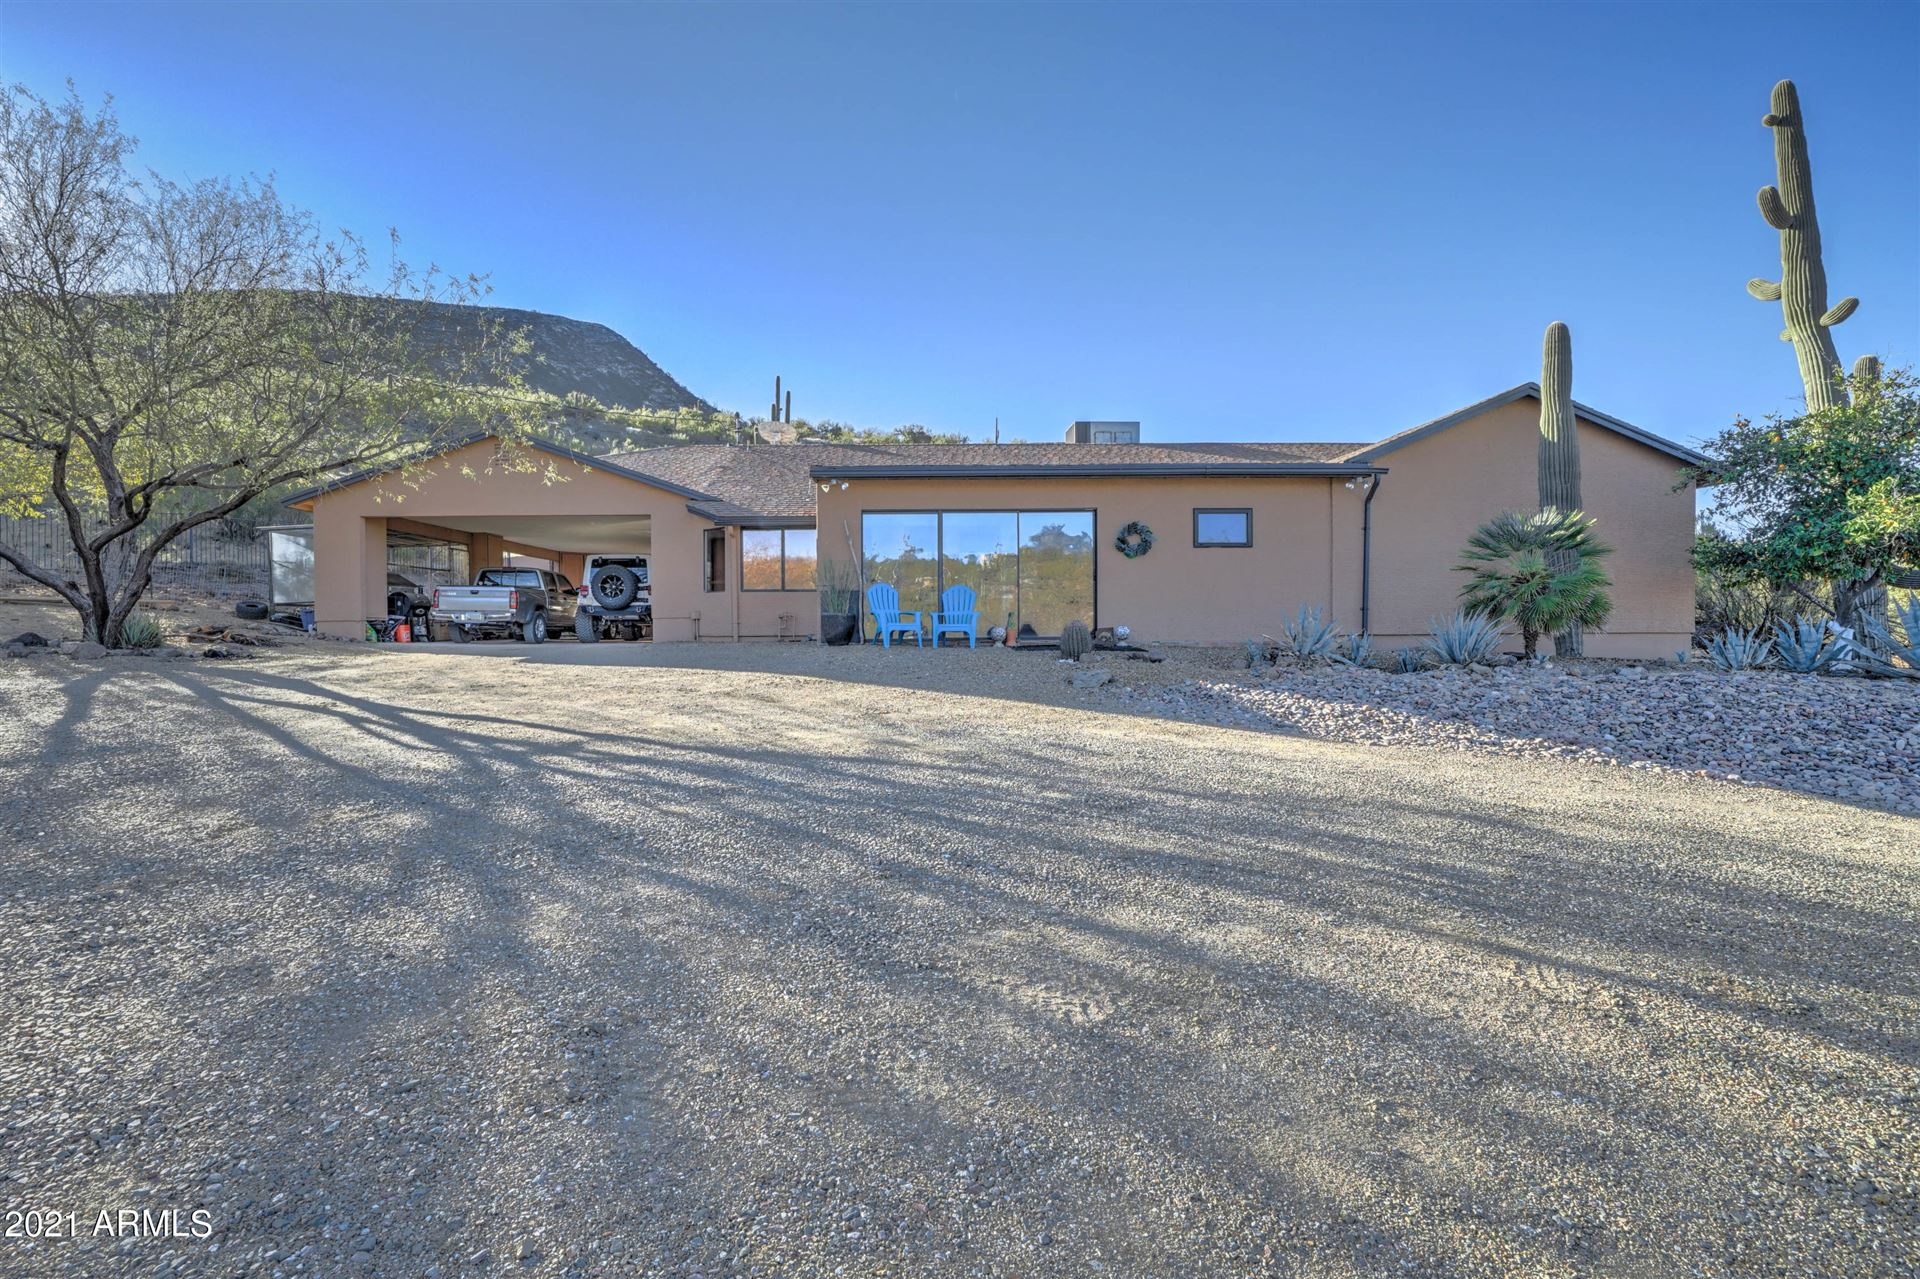 Photo of 42811 N 21ST Street, New River, AZ 85087 (MLS # 6194609)